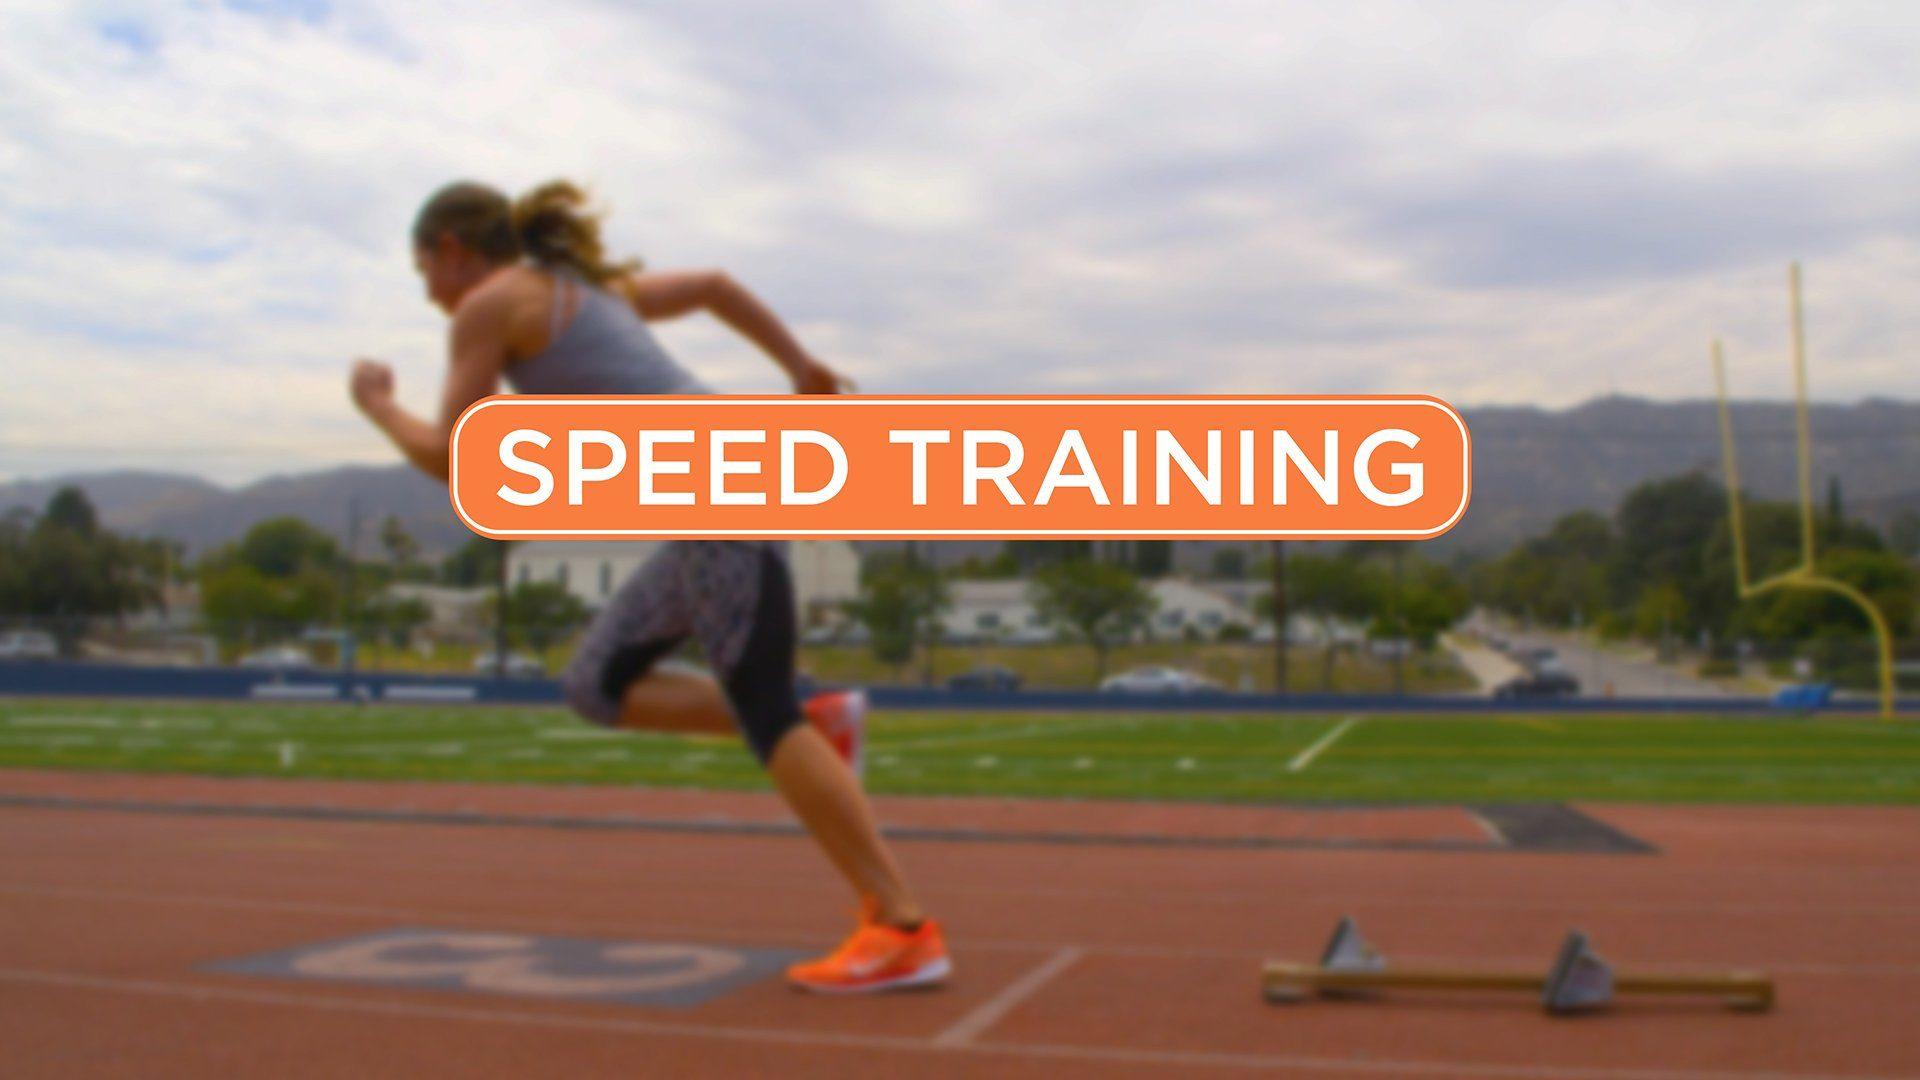 4 week speed training program